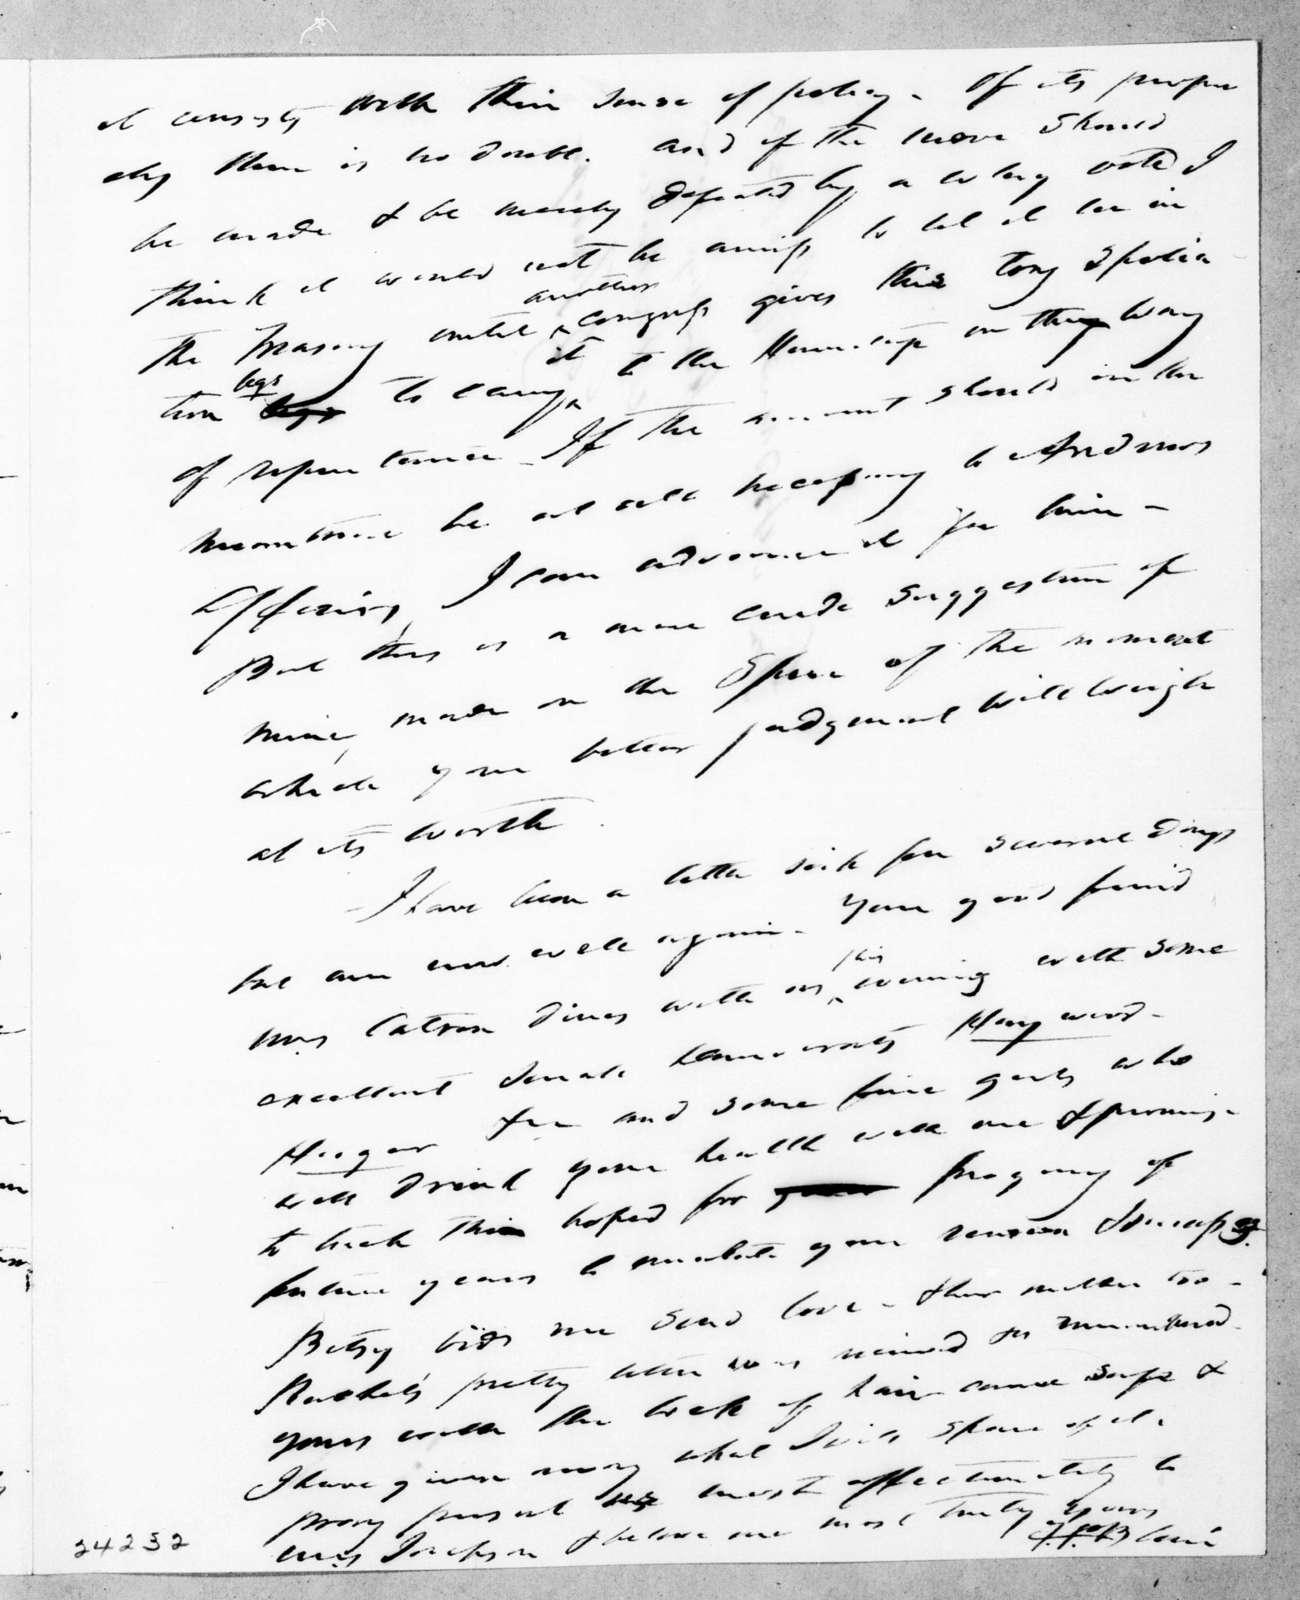 Francis Preston Blair to Andrew Jackson, February 11, 1844